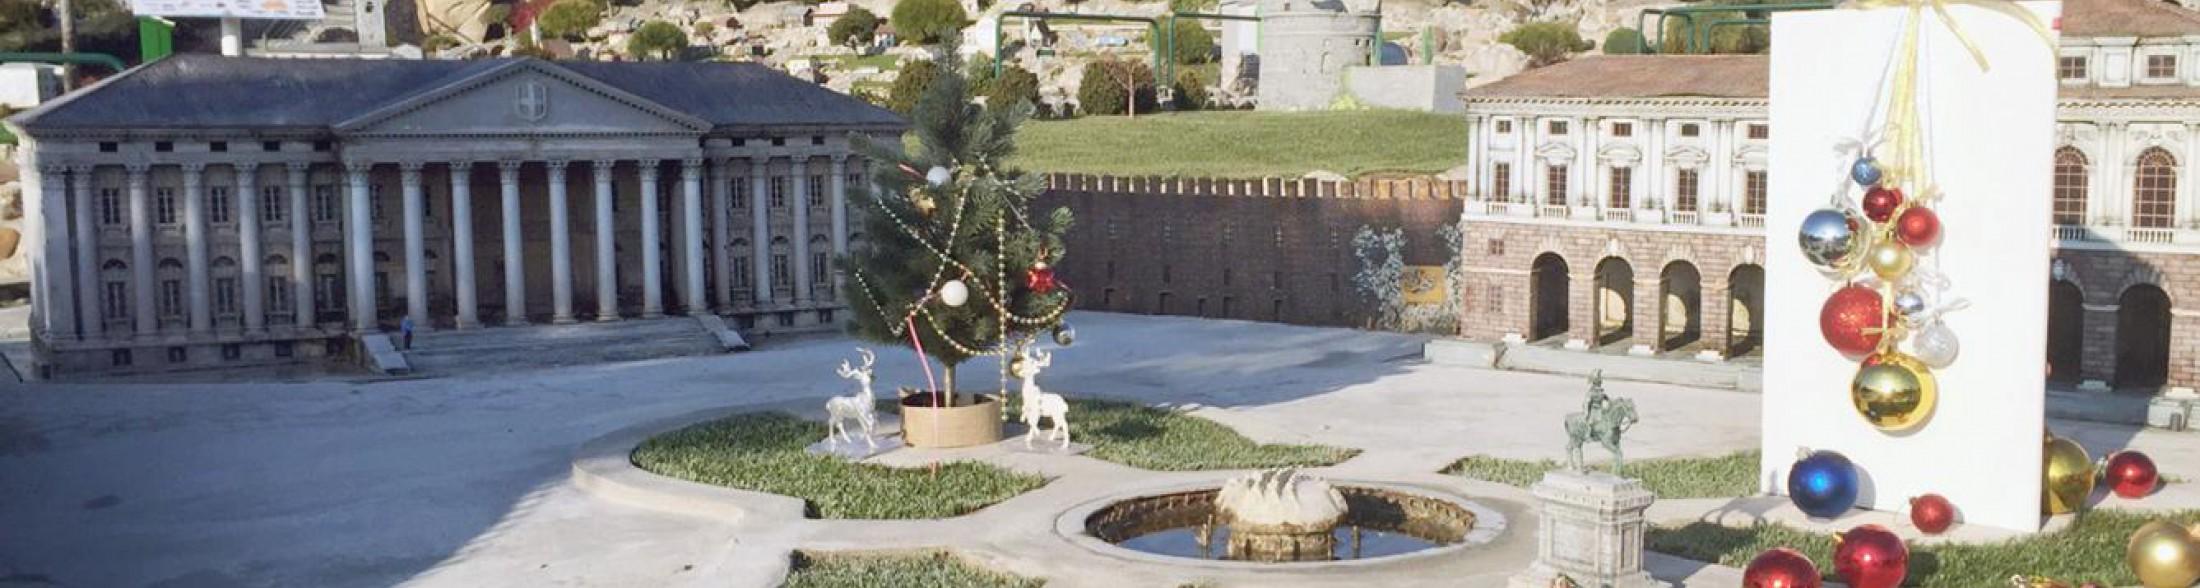 Natale a Italia in Miniatura